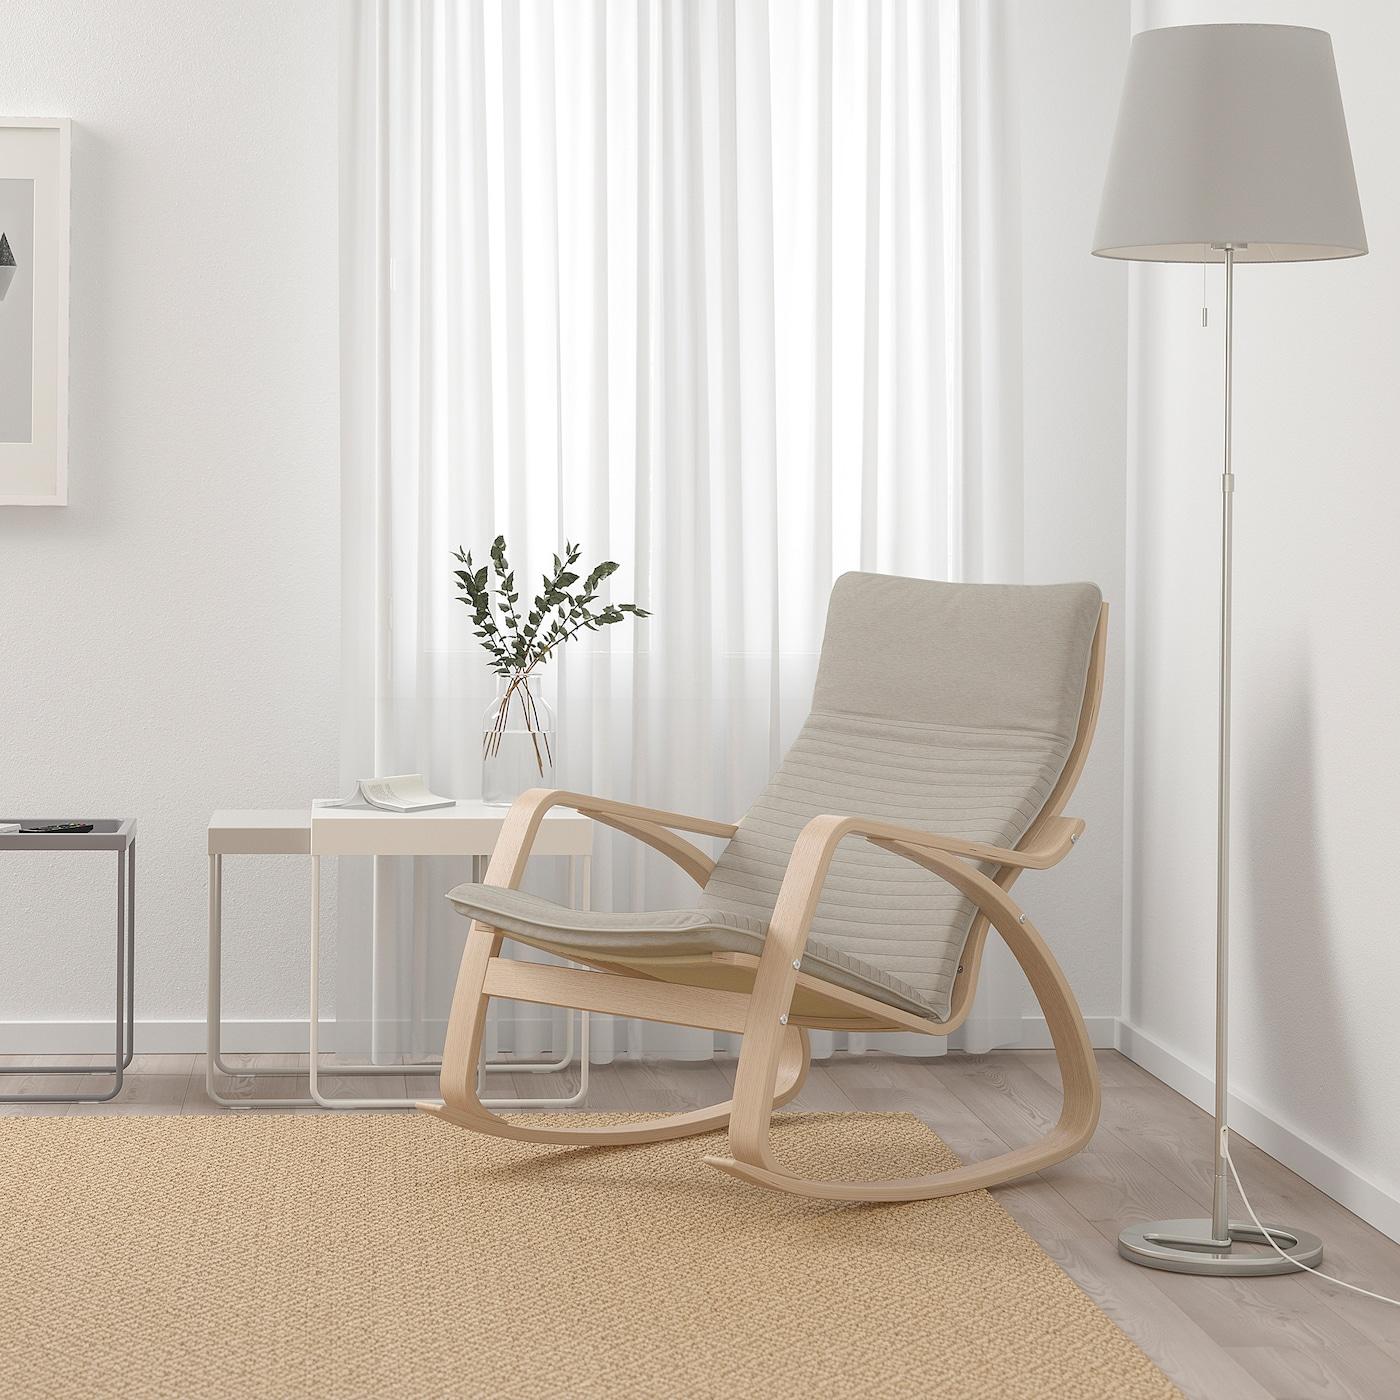 POÄNG Rocking chair white stained oak veneer, Knisa light beige